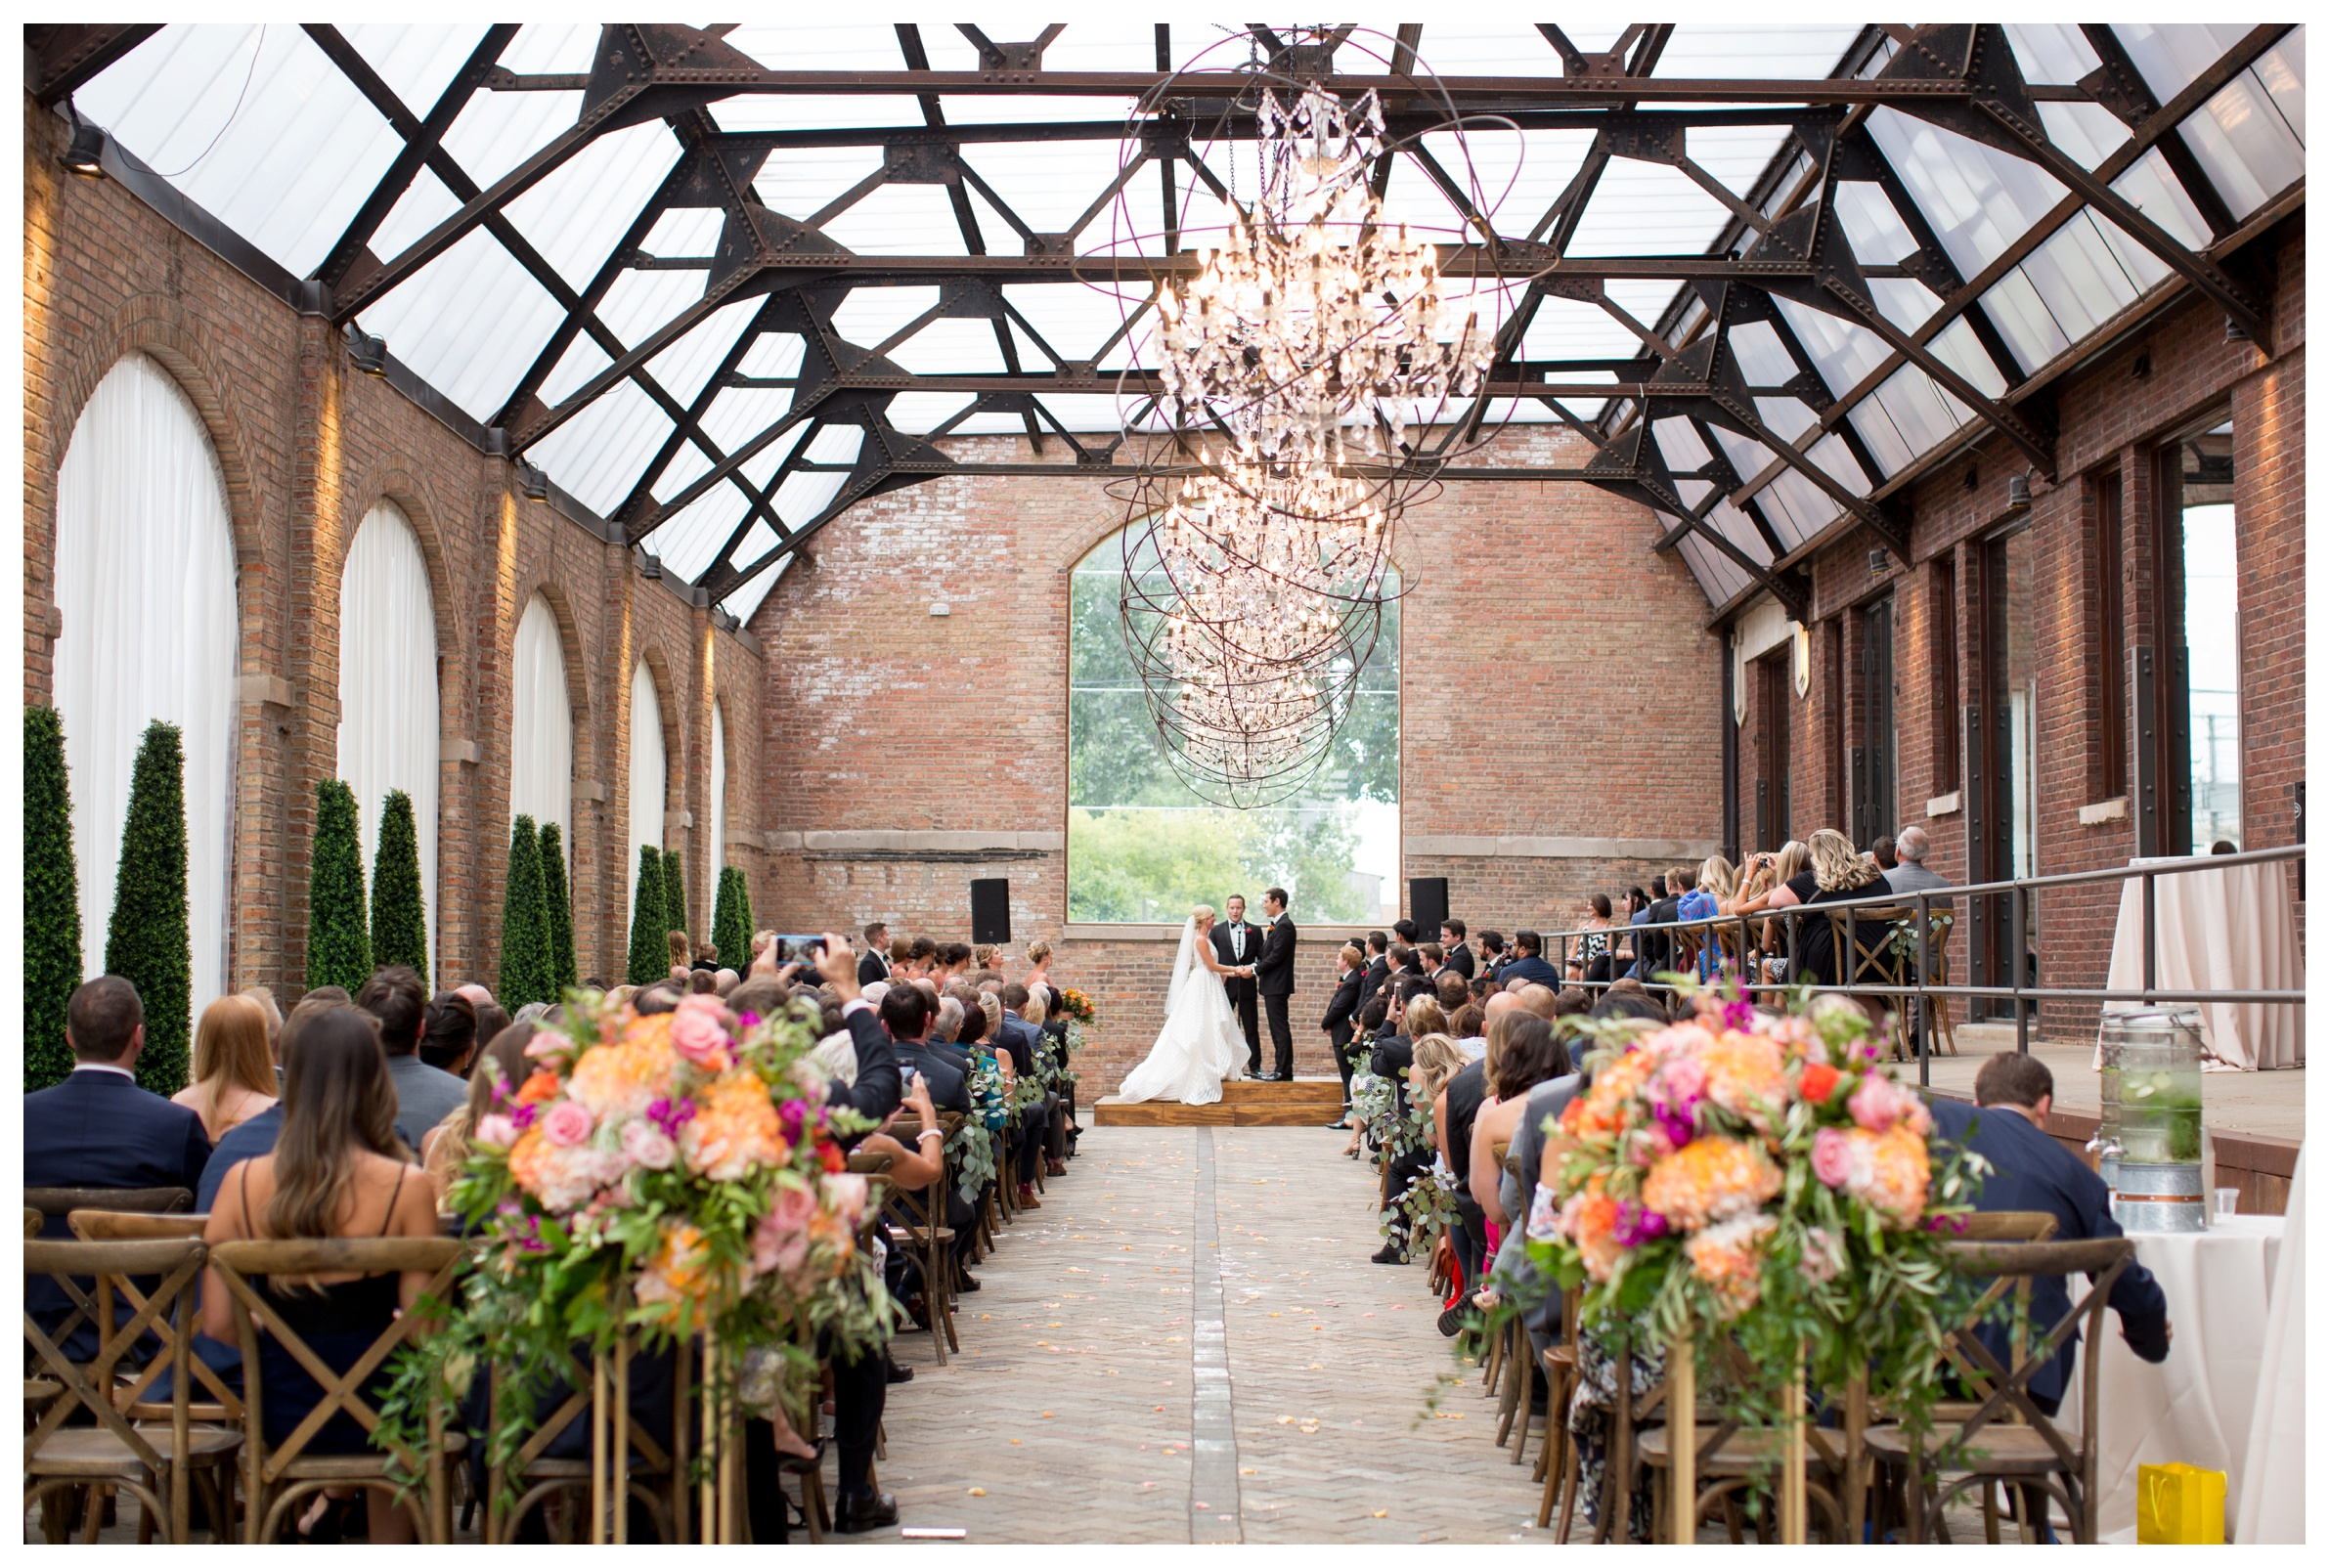 bridgeport-art-center-sculpture-garden-wedding-ceremony-photos